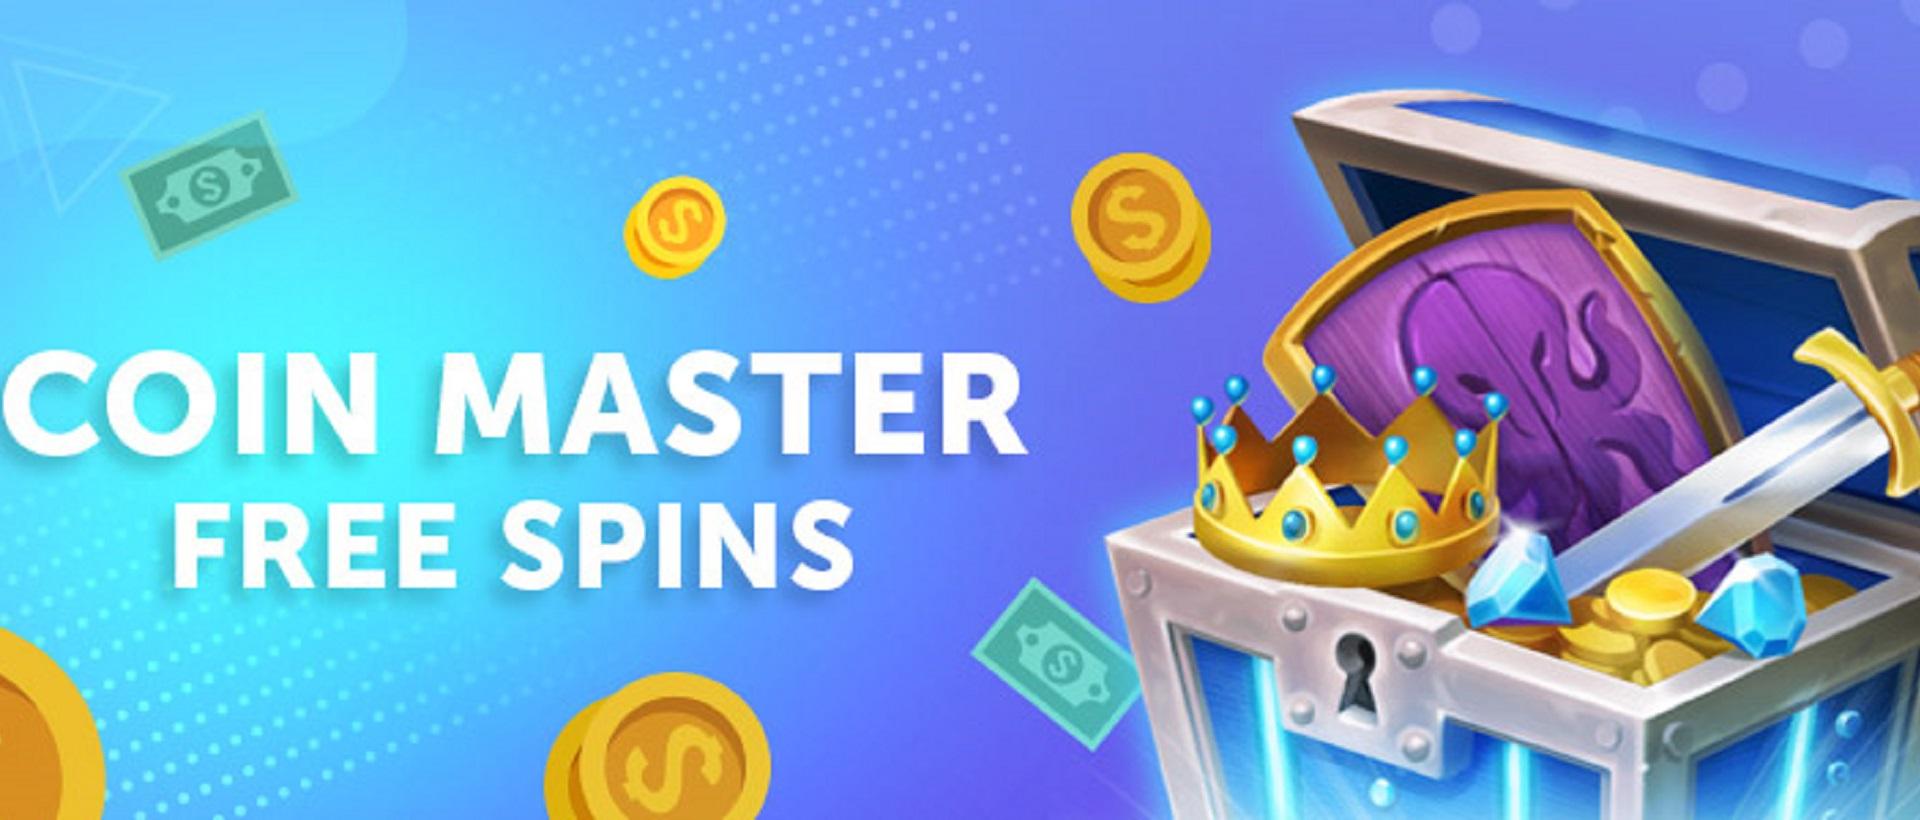 CM Rewards: Coin Master Spins and Coins Bonus